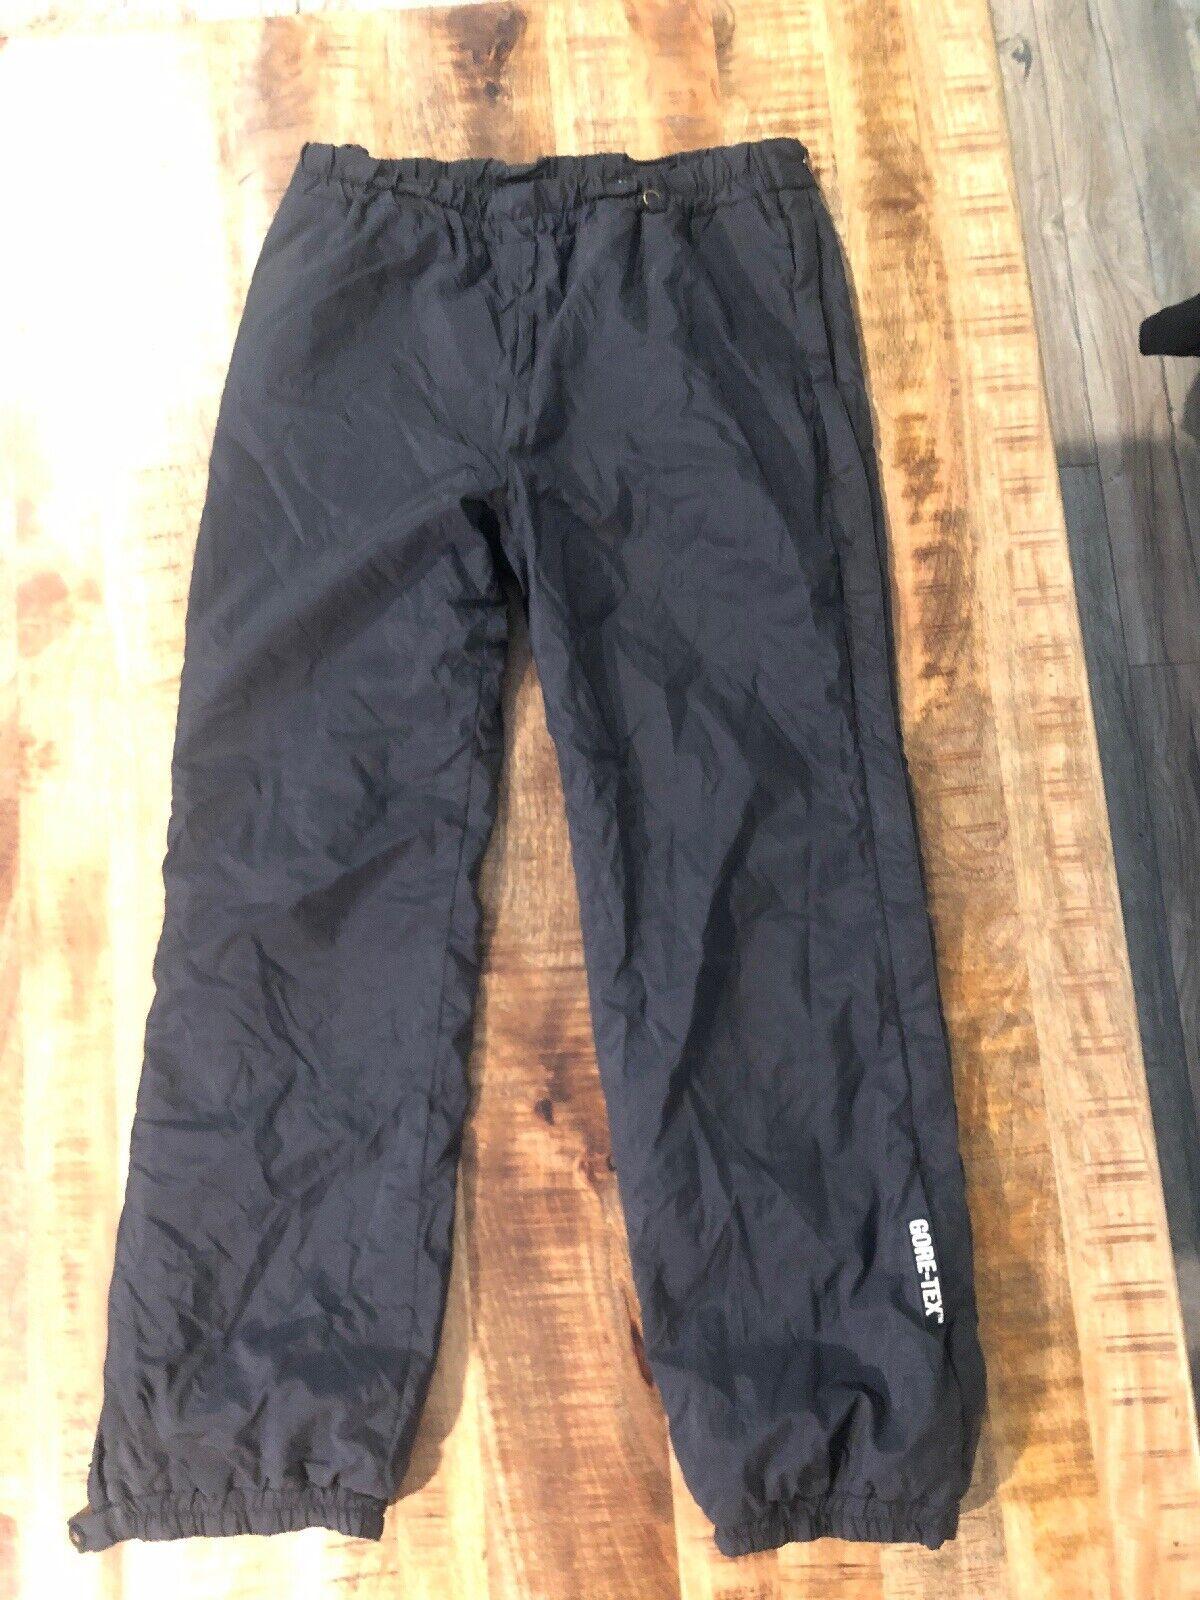 Vintage Alpine Designs Goretex Pants Ski Pants Snow Hong Kong Men's Large New